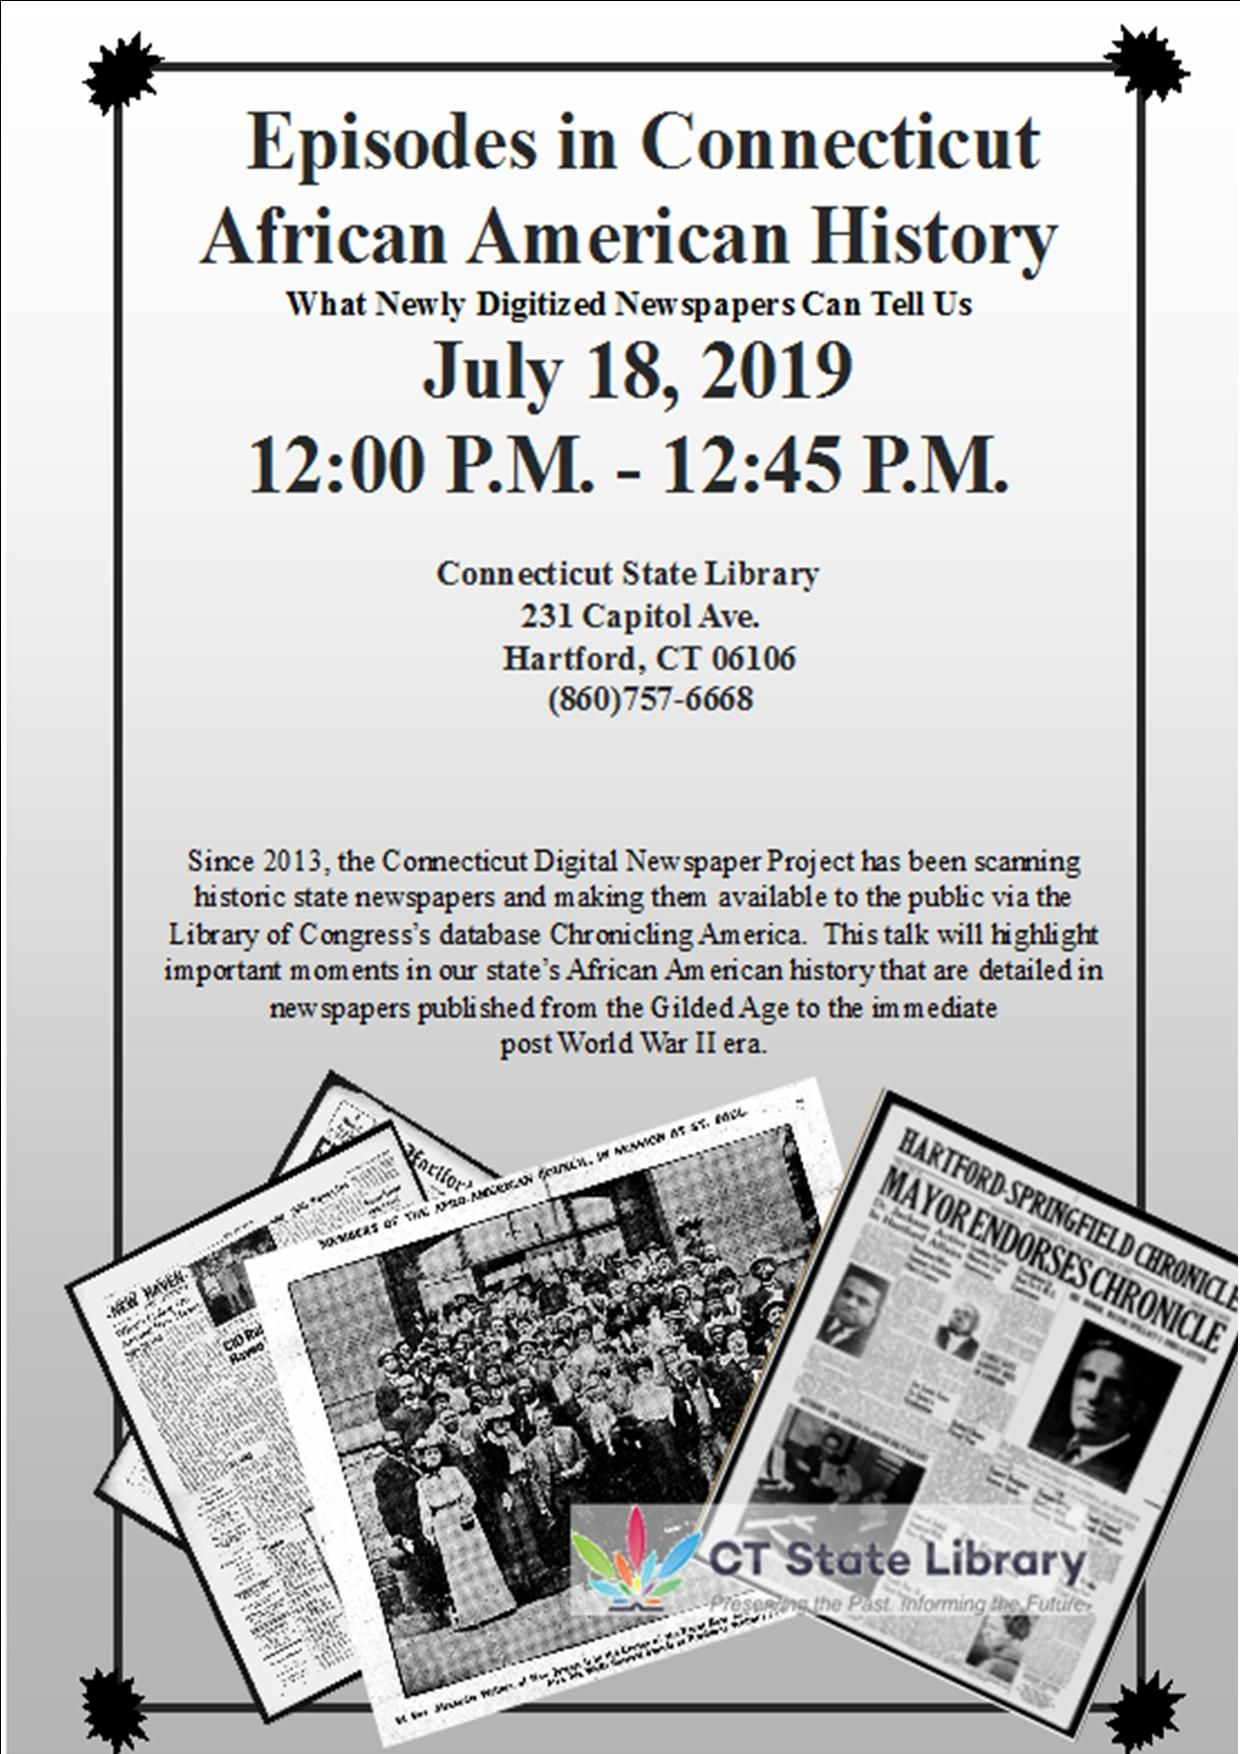 Connecticut Digital Newspaper Project – Preserving